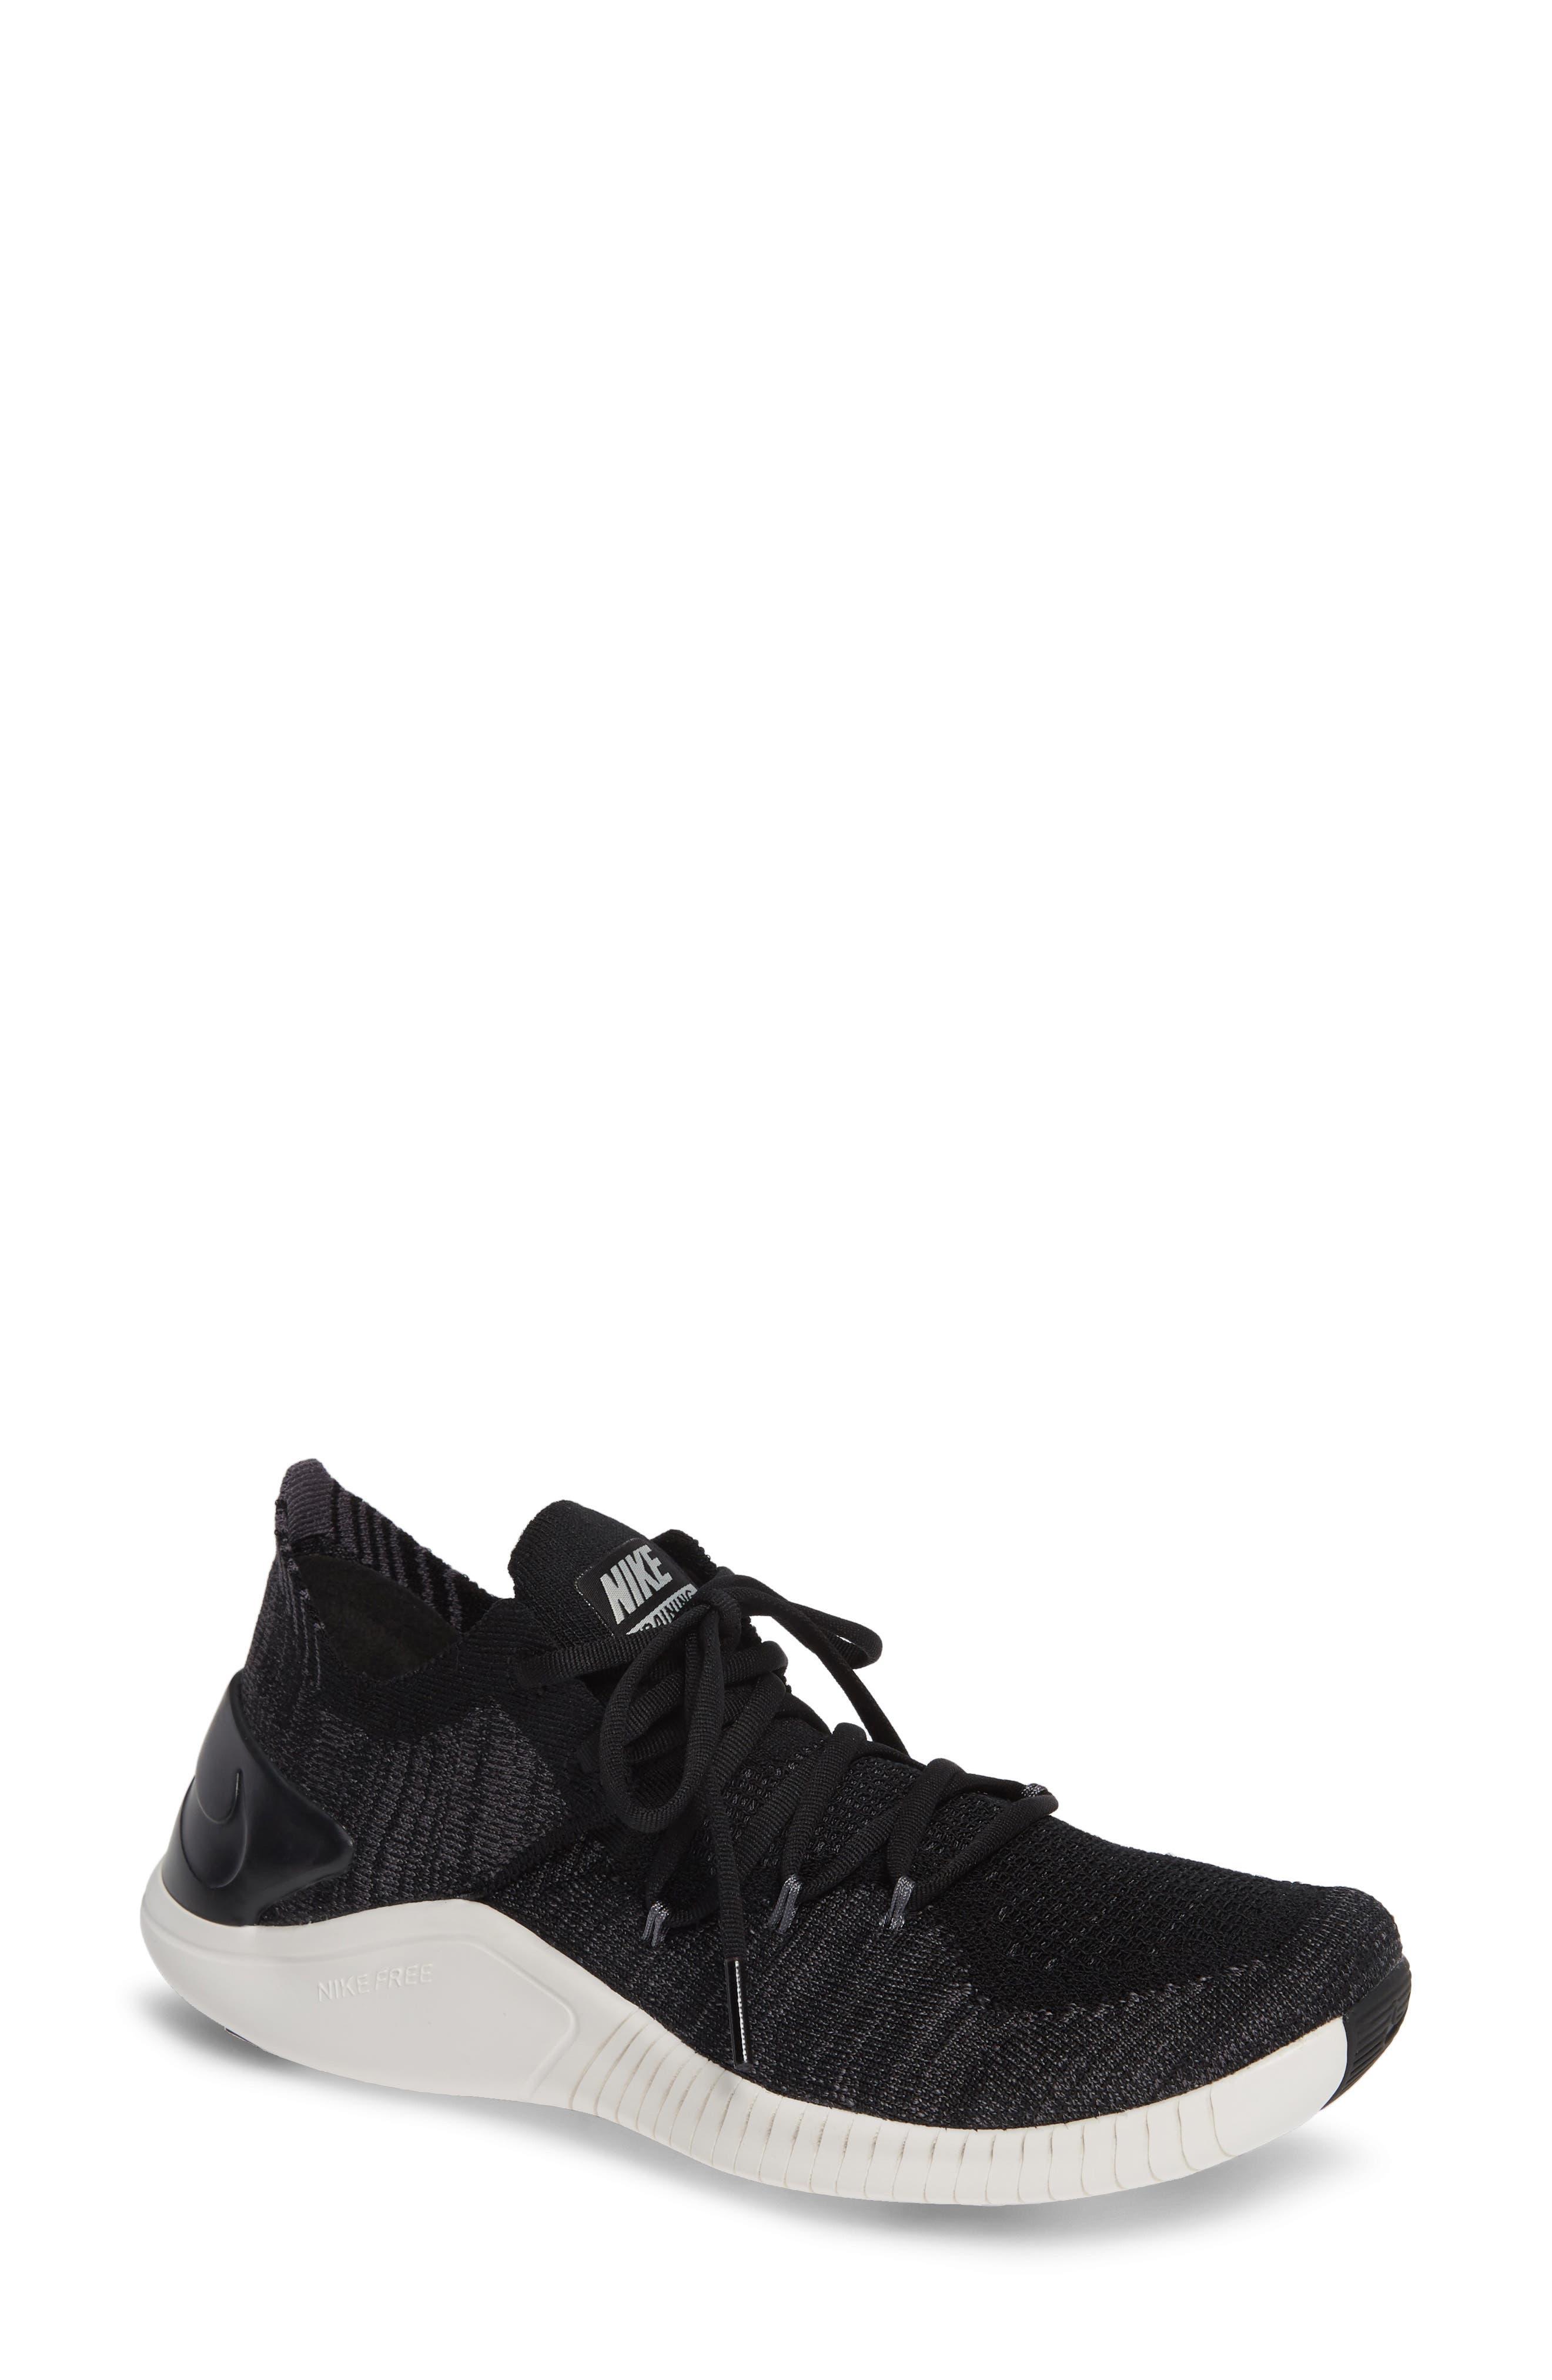 Free TR Flyknit 3 Training Shoe,                         Main,                         color, BLACK/ DARK GREY-PHANTOM